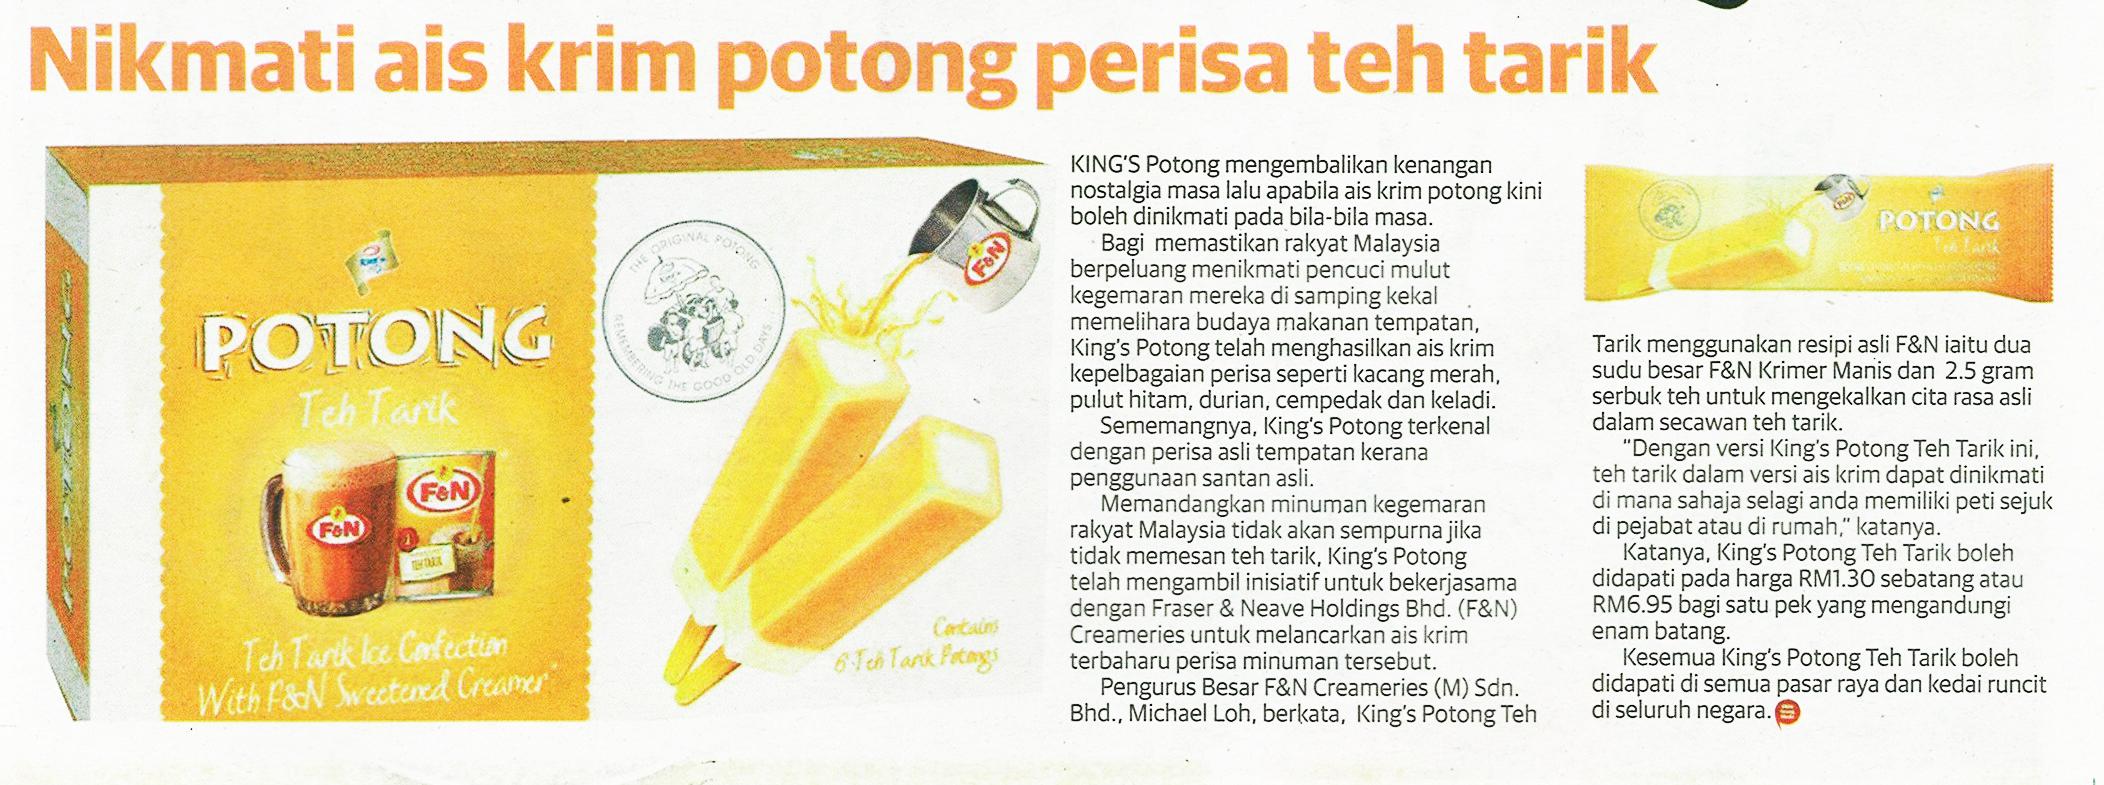 Utusan Malaysia 230116